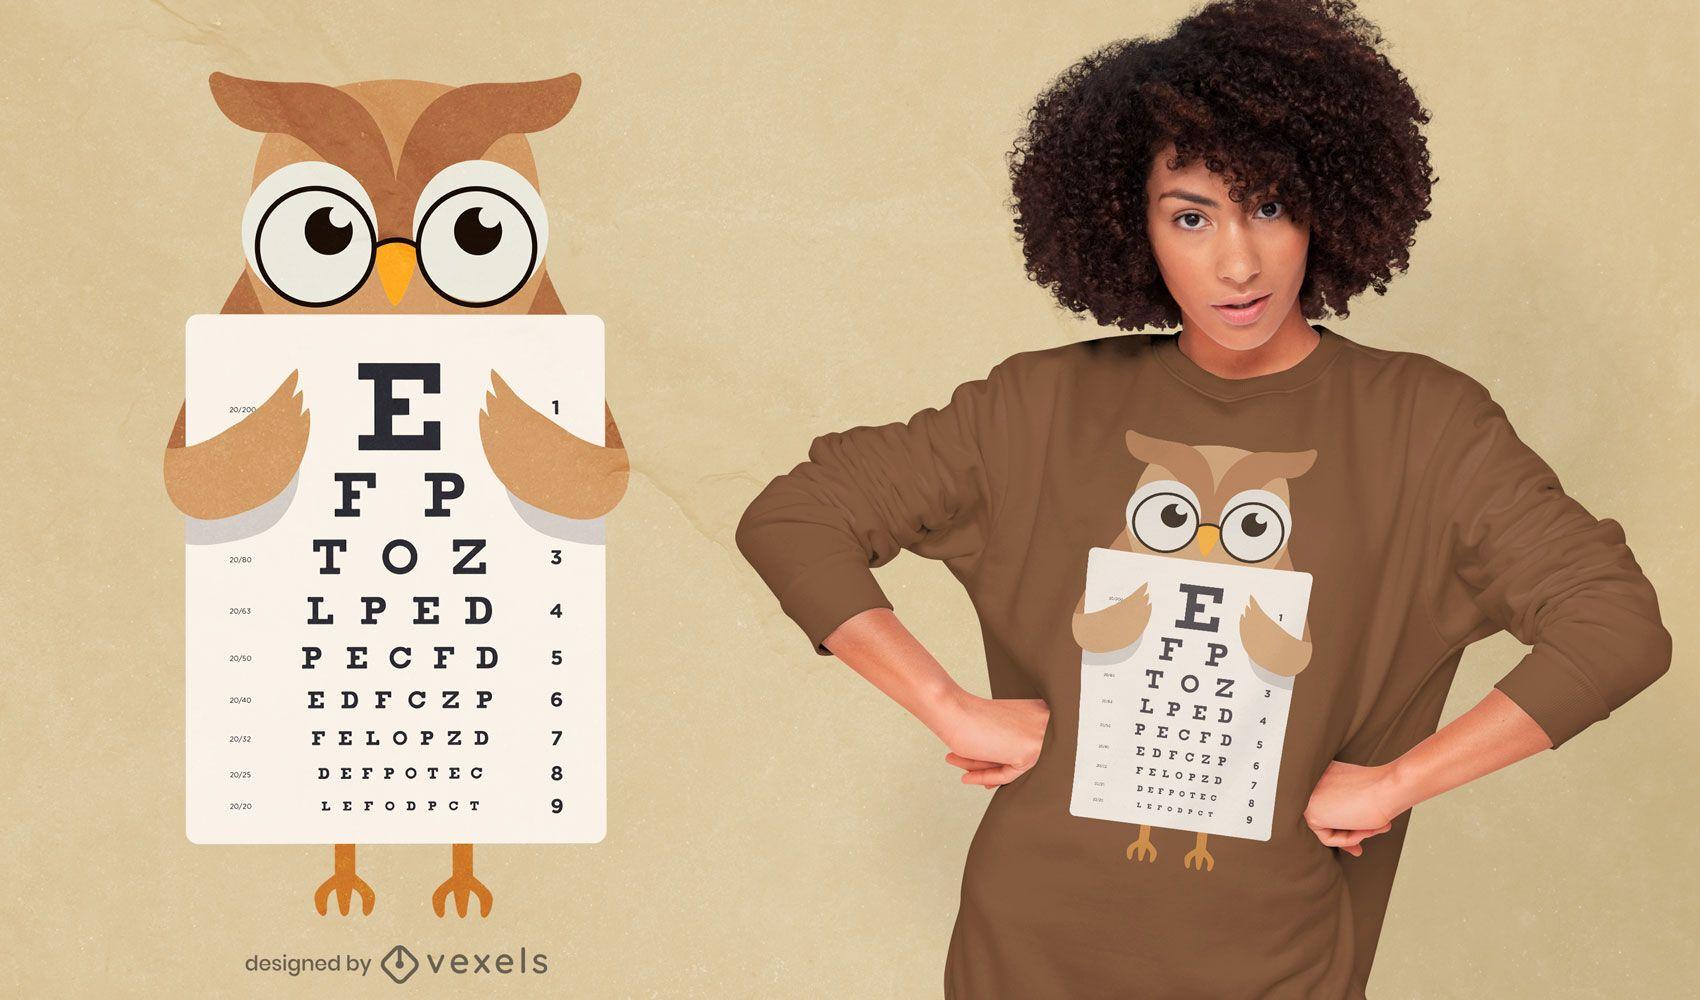 Eulen-Augendiagramm-T-Shirt-Design